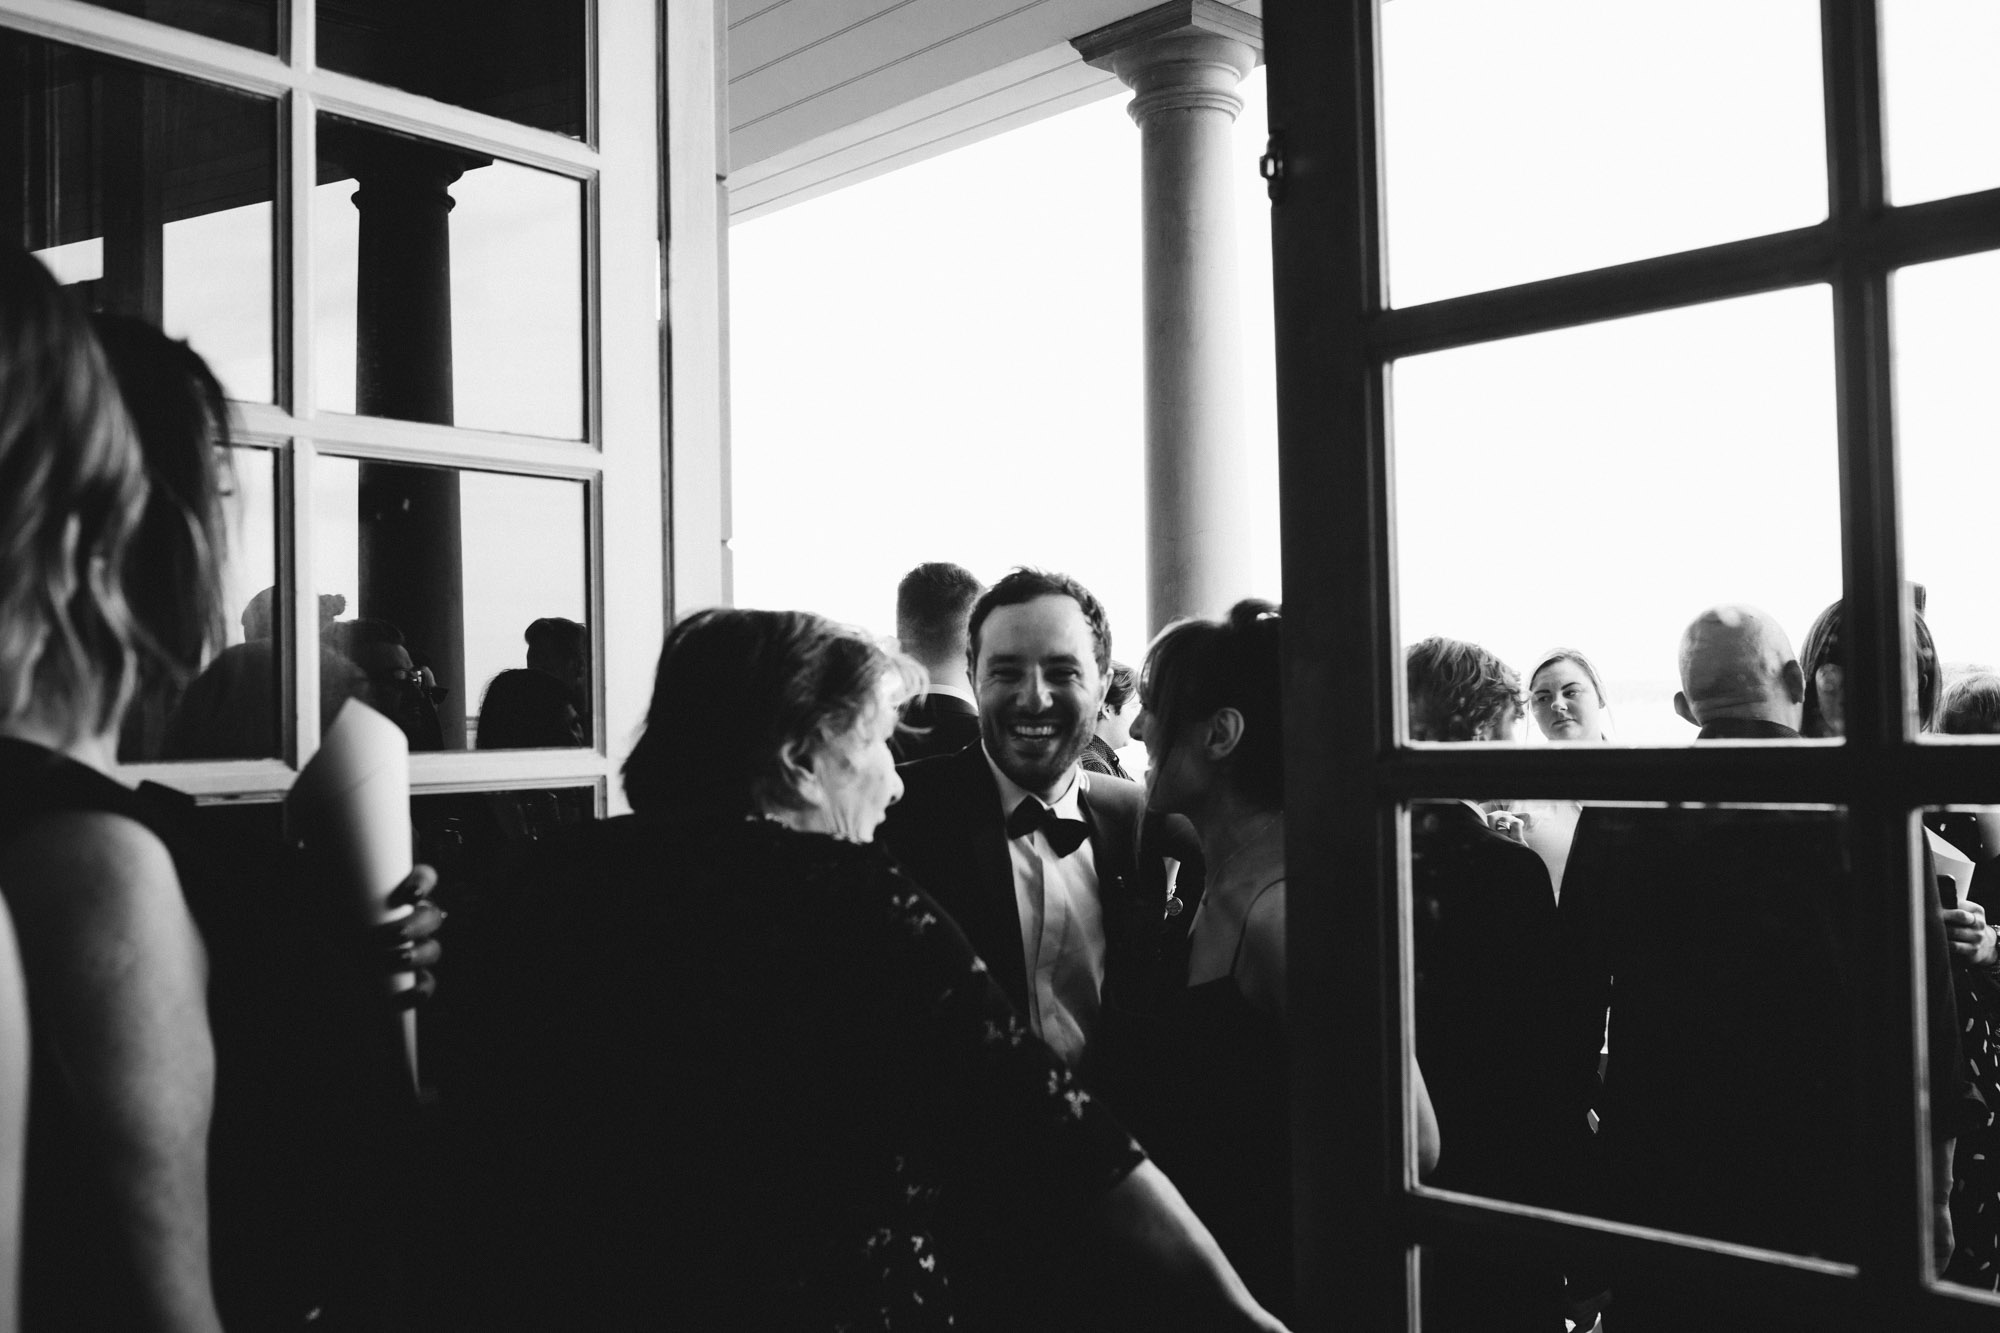 Campbell Point House Wedding HJ + Dean Raphael Weddings-44.jpg